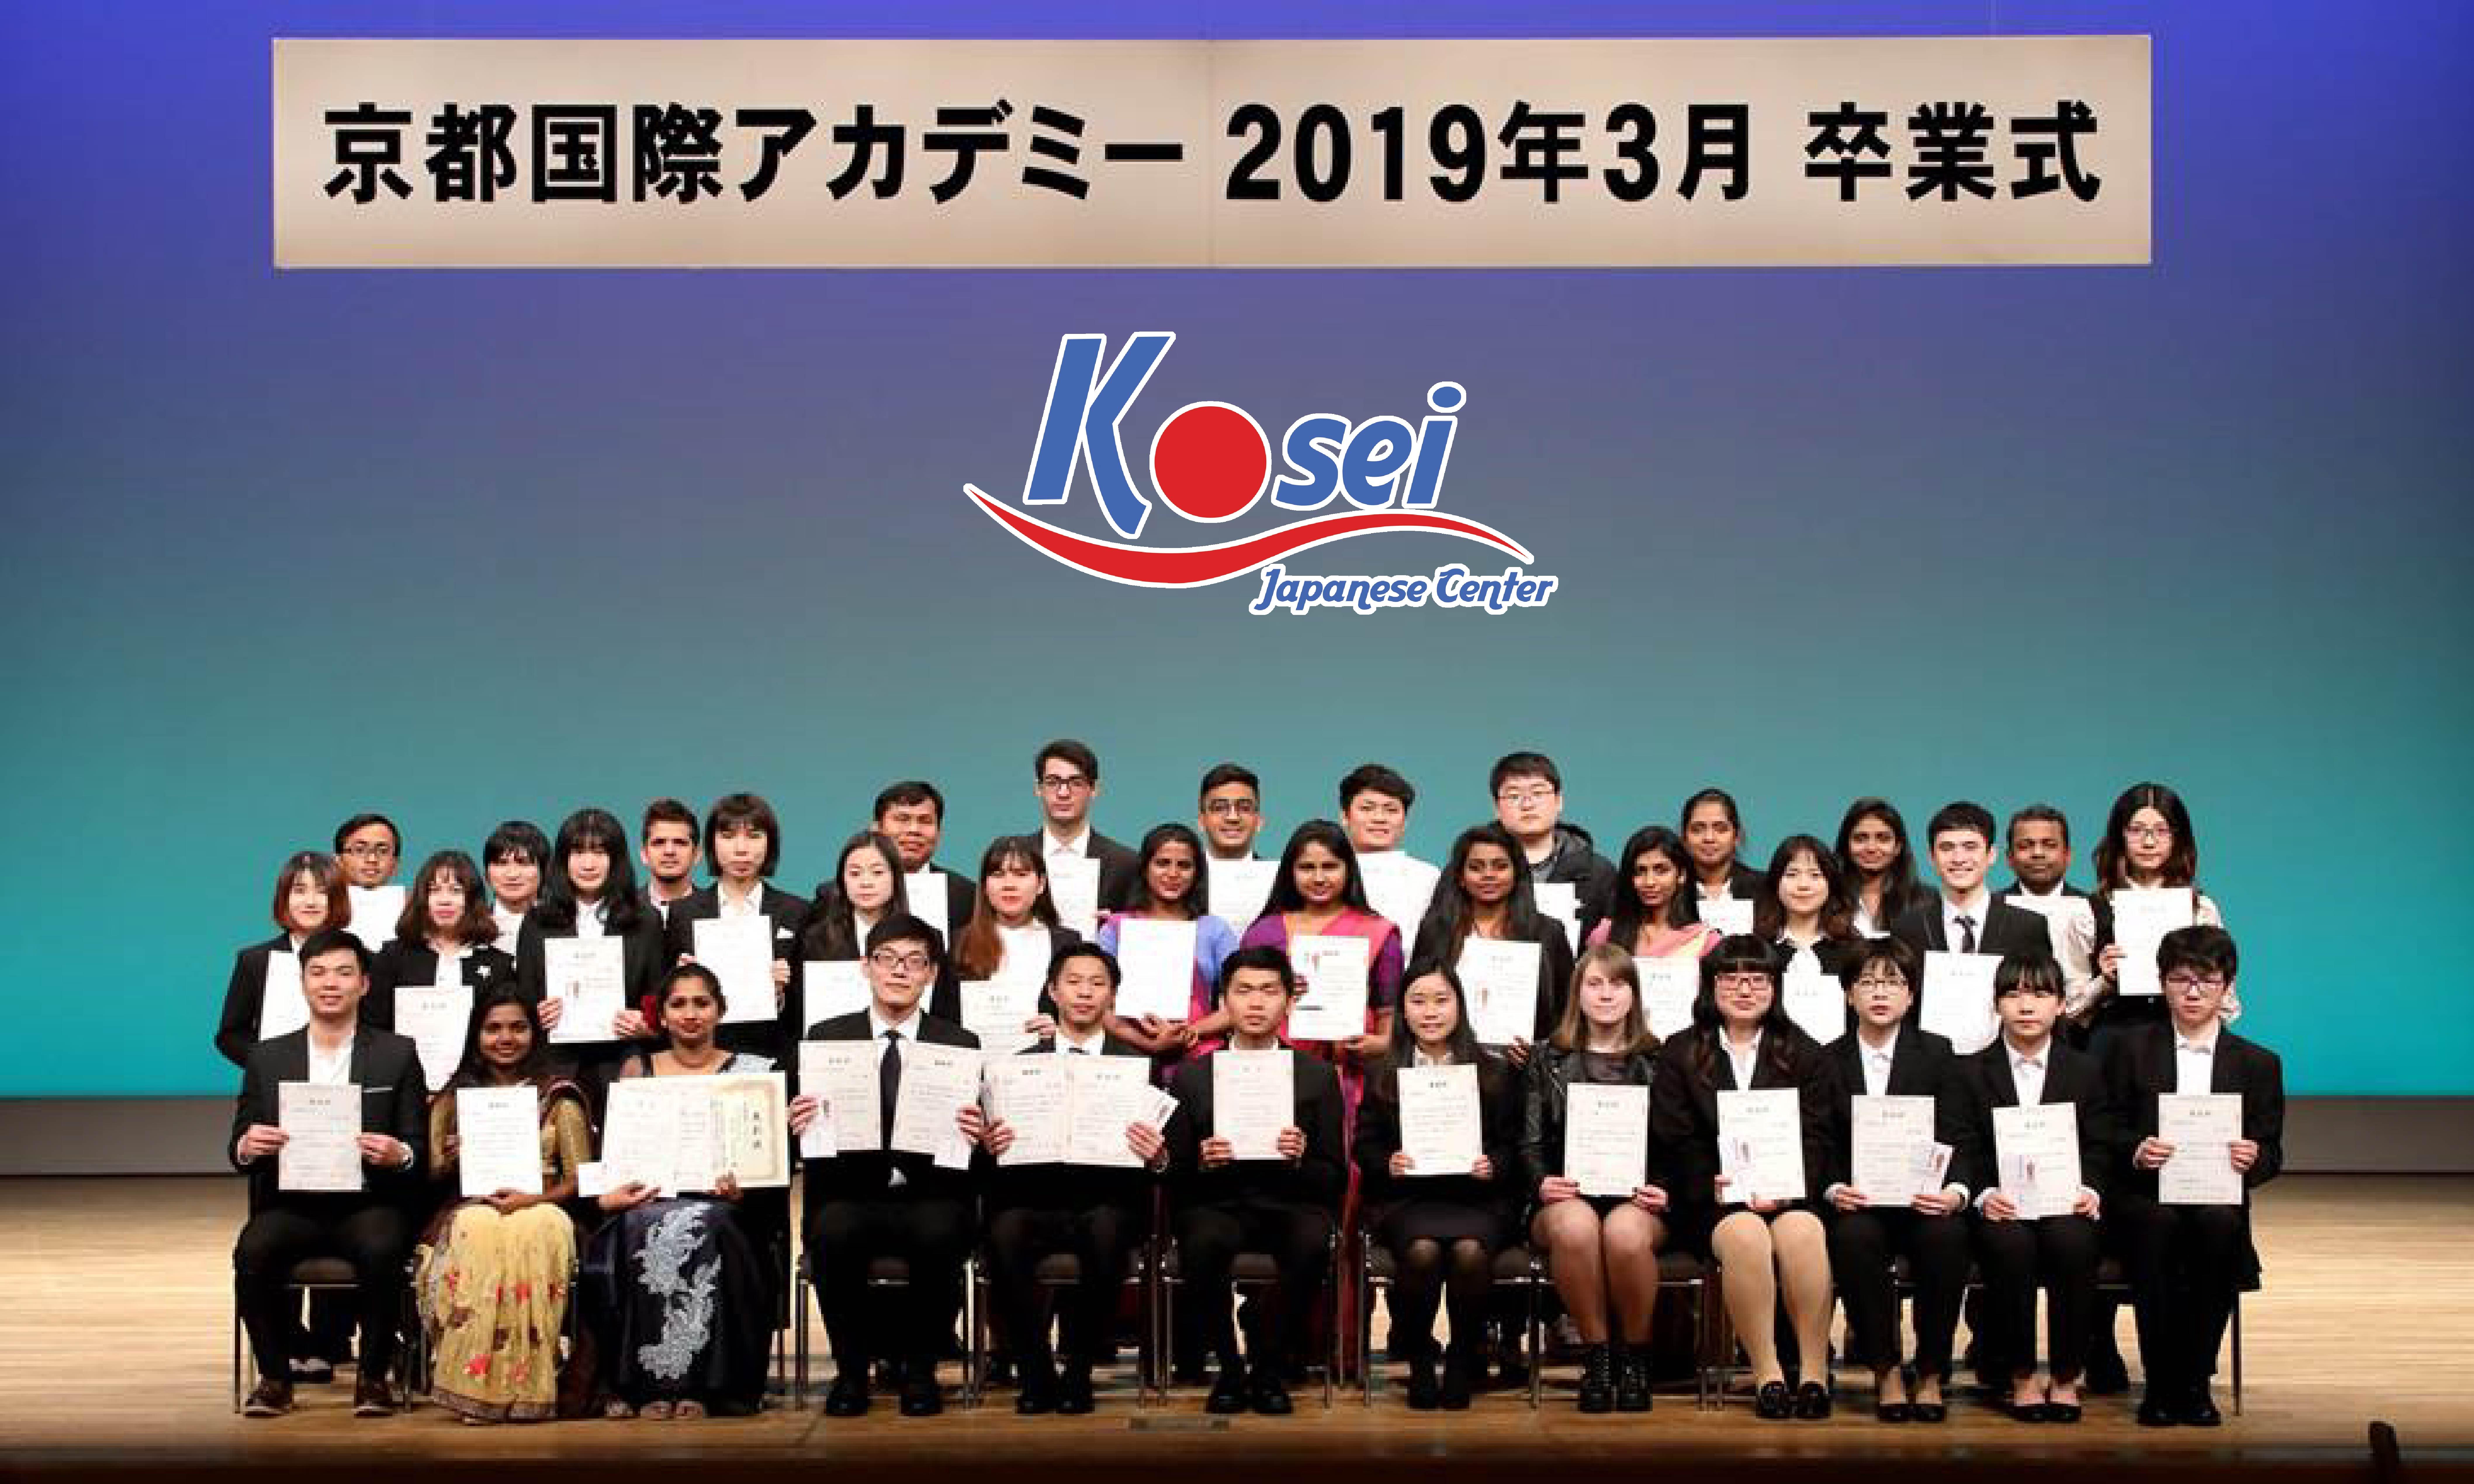 http://kosei.vn/thong-tin-truong-quoc-te-kyoto-academy-n2303.html